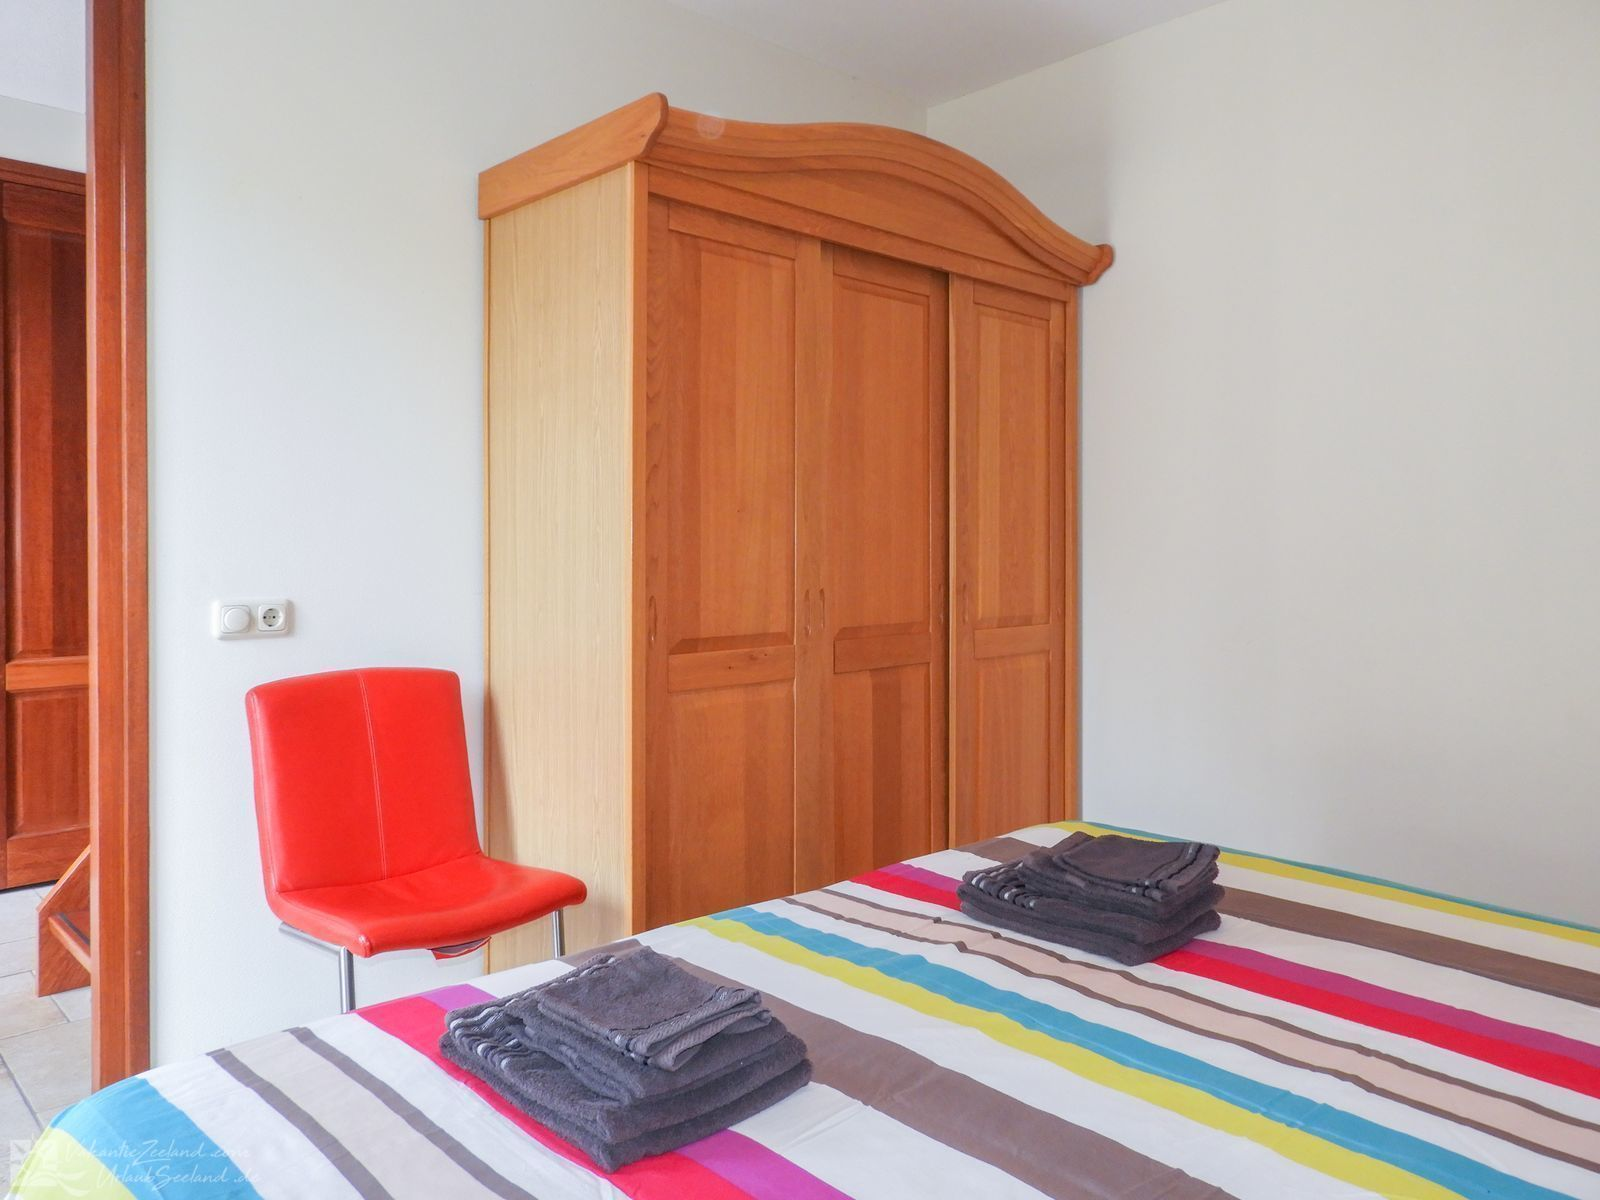 VZ523 Holiday Apartment Kattendijke